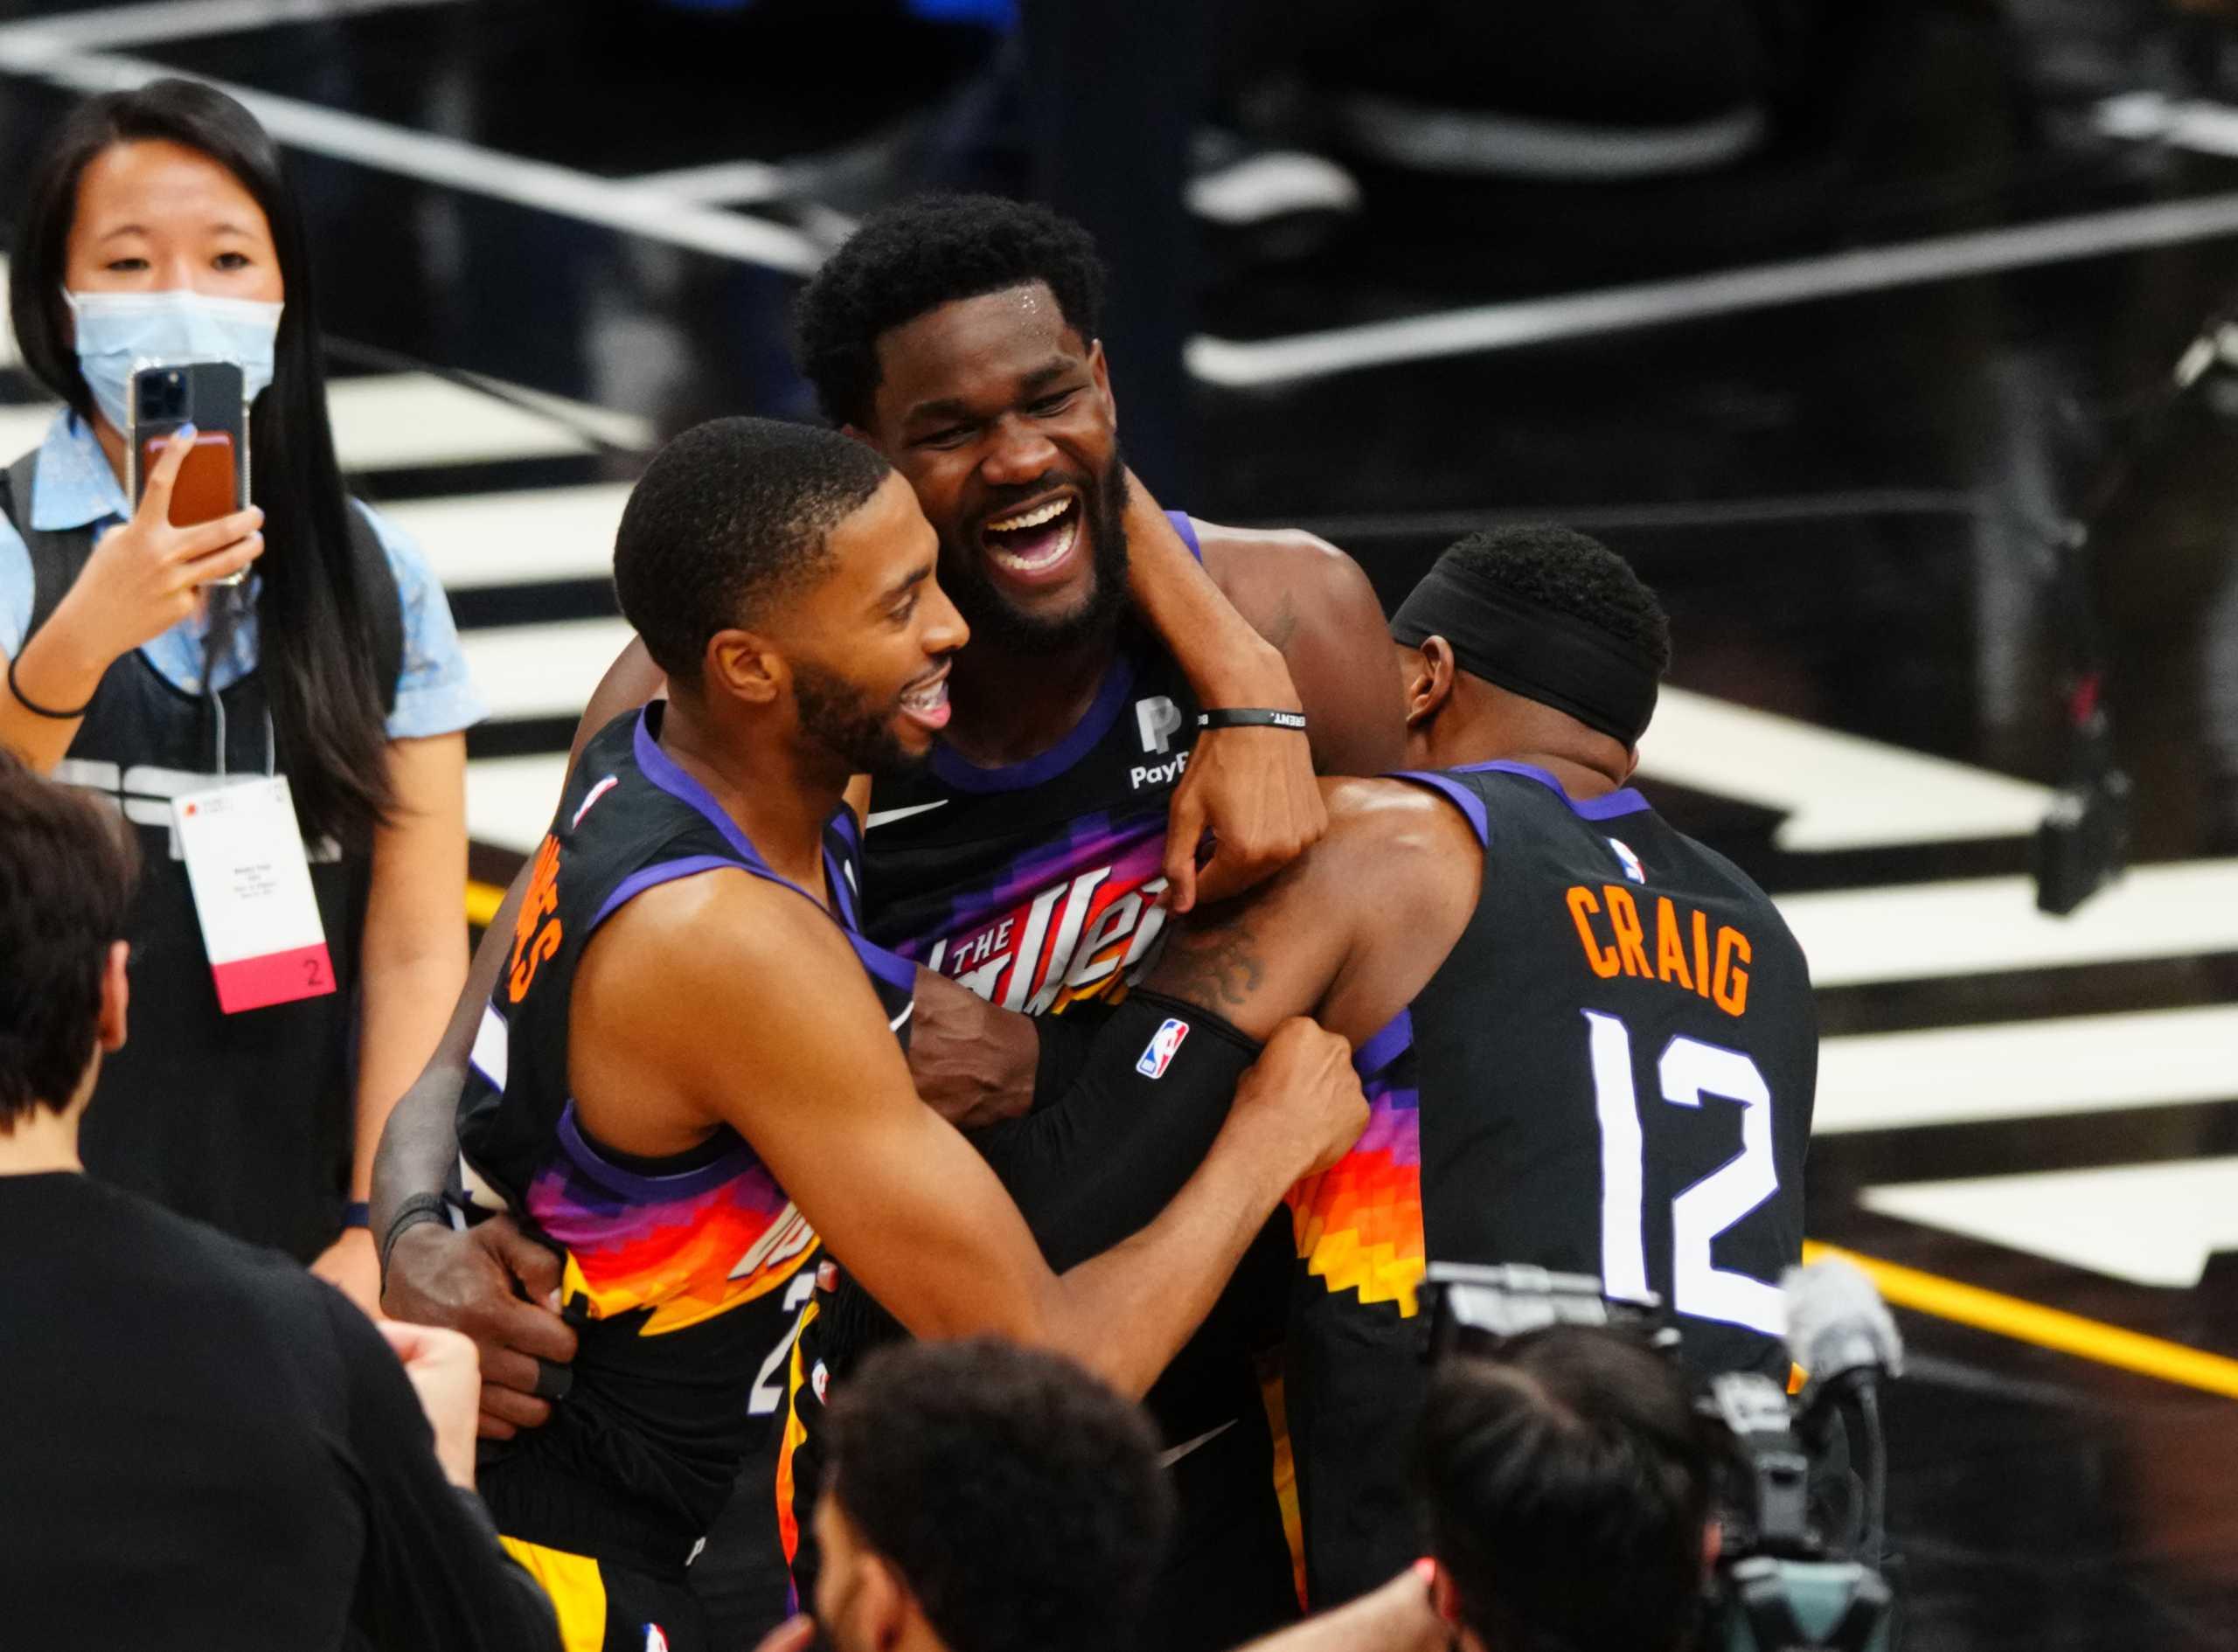 NBA: Οι Σανς πήραν το «θρίλερ»  με τους Κλίπερς και προηγούνται με 2-0 στους τελικούς της Δύσης